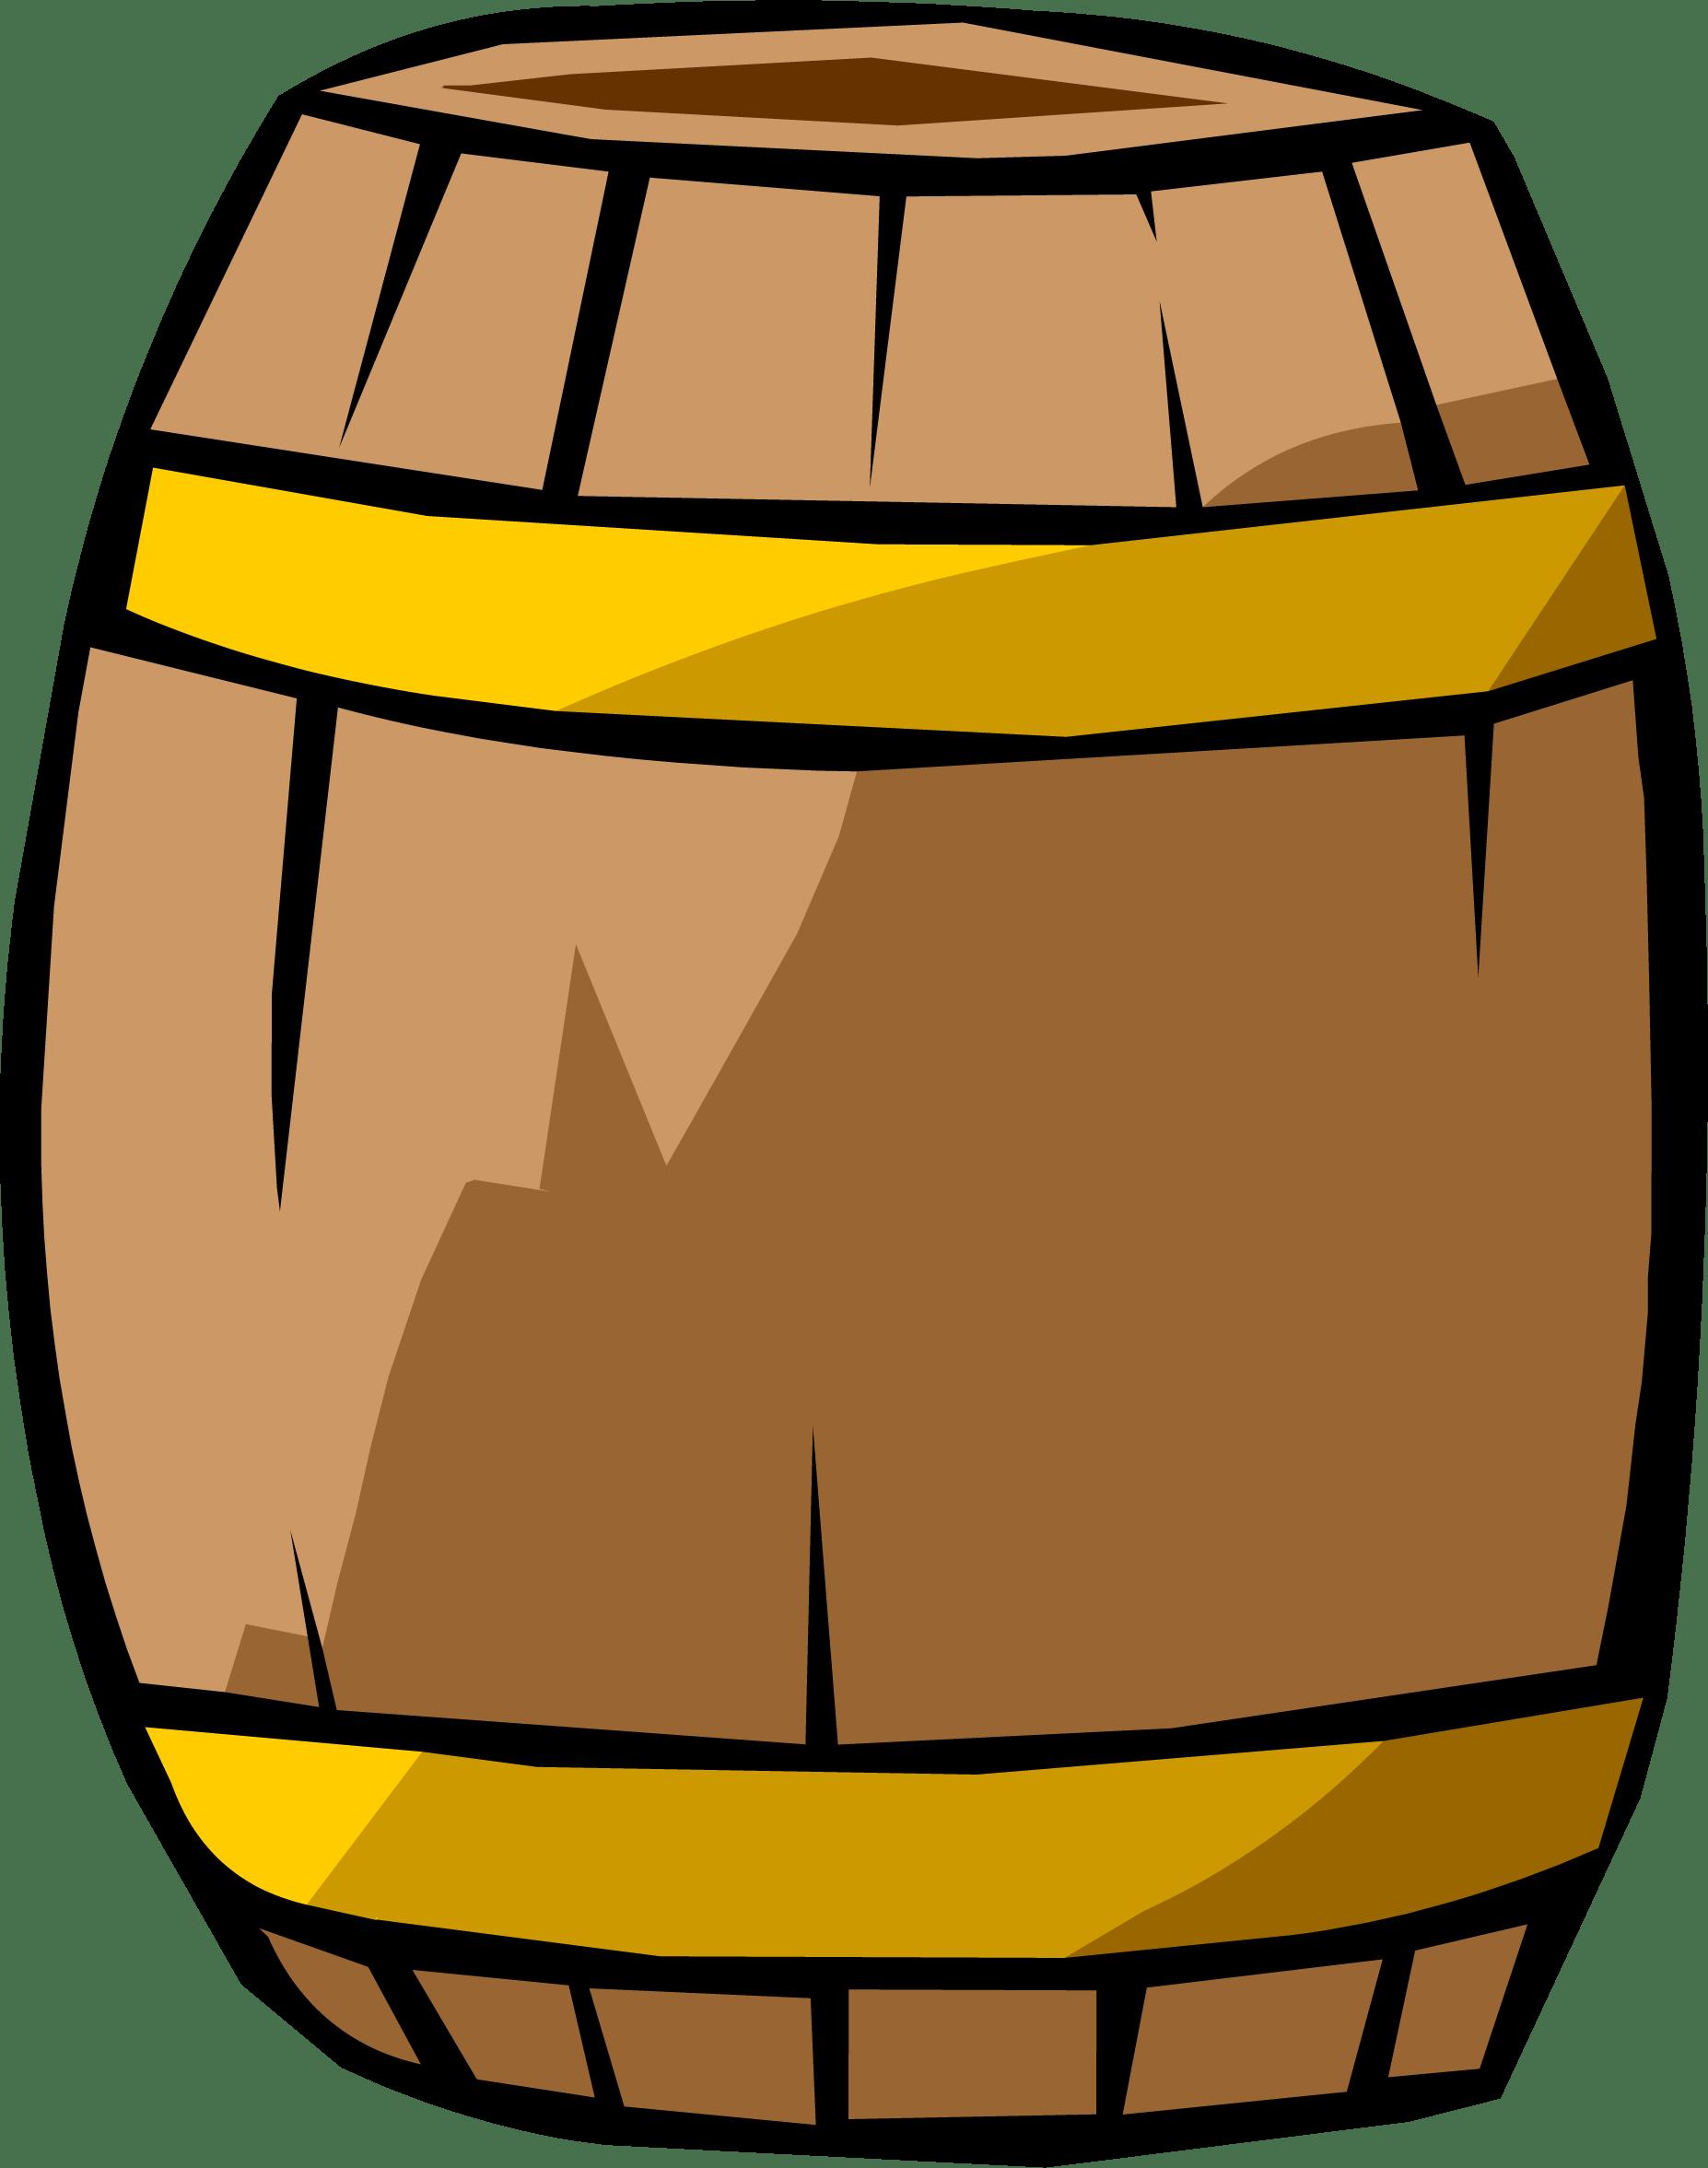 Bbarrel clipart jpg free download Barrel Clipart transparent PNG - StickPNG jpg free download